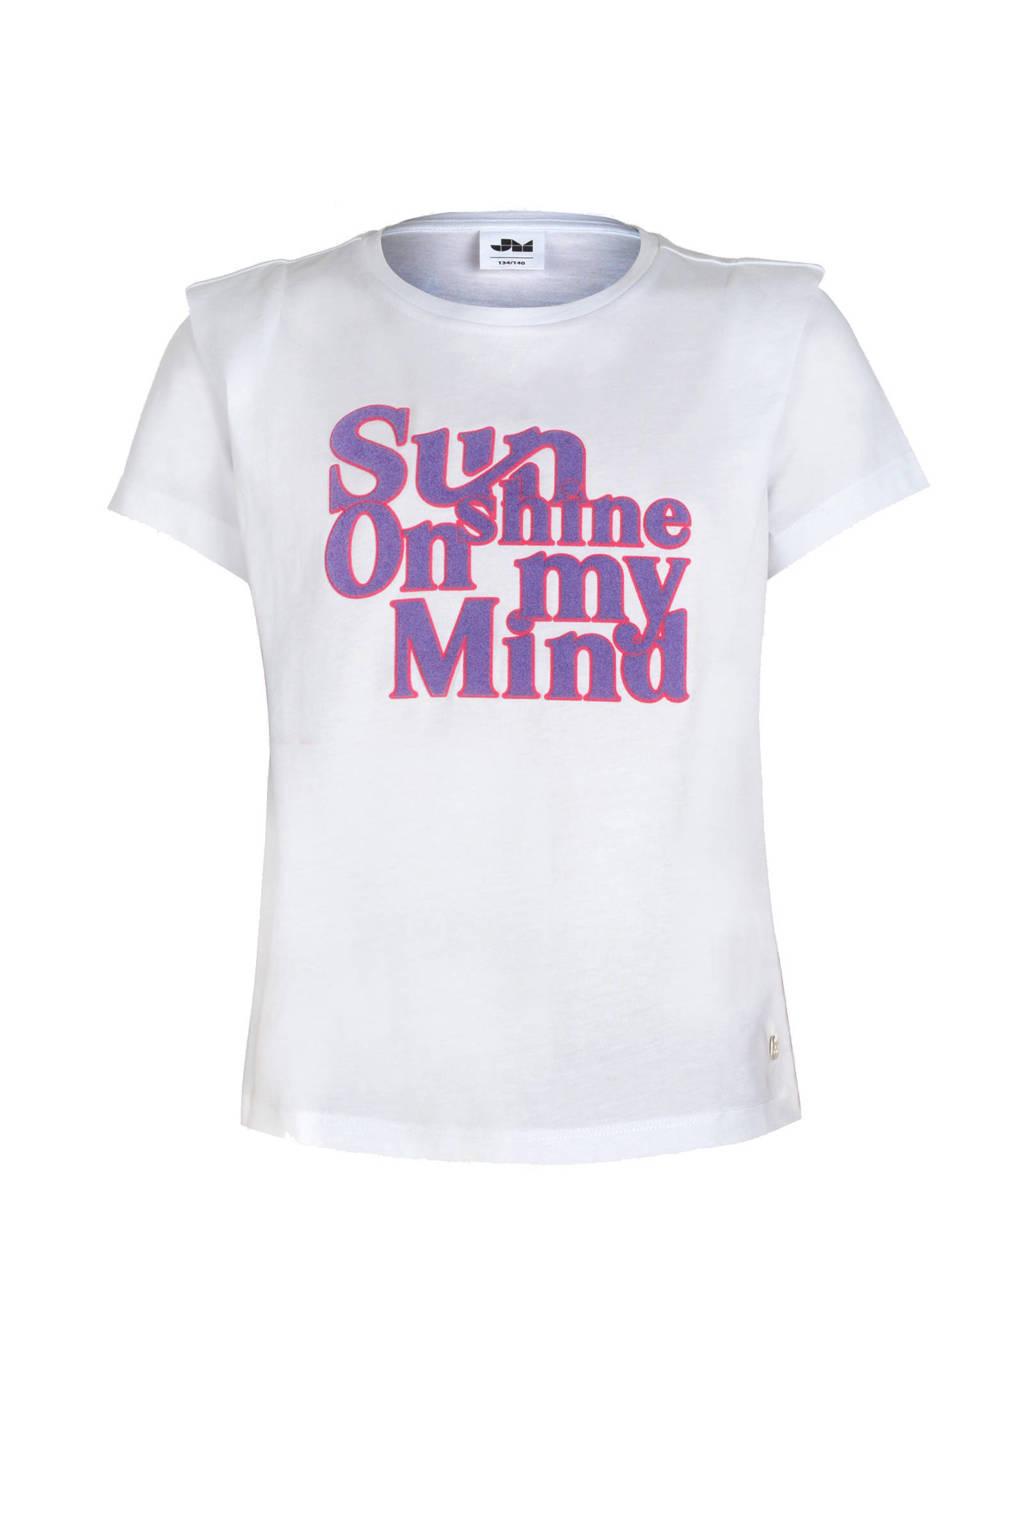 Jill & Mitch by Shoeby T-shirt Kreta met tekst wit/paars/koraalrood, Wit/paars/koraalrood